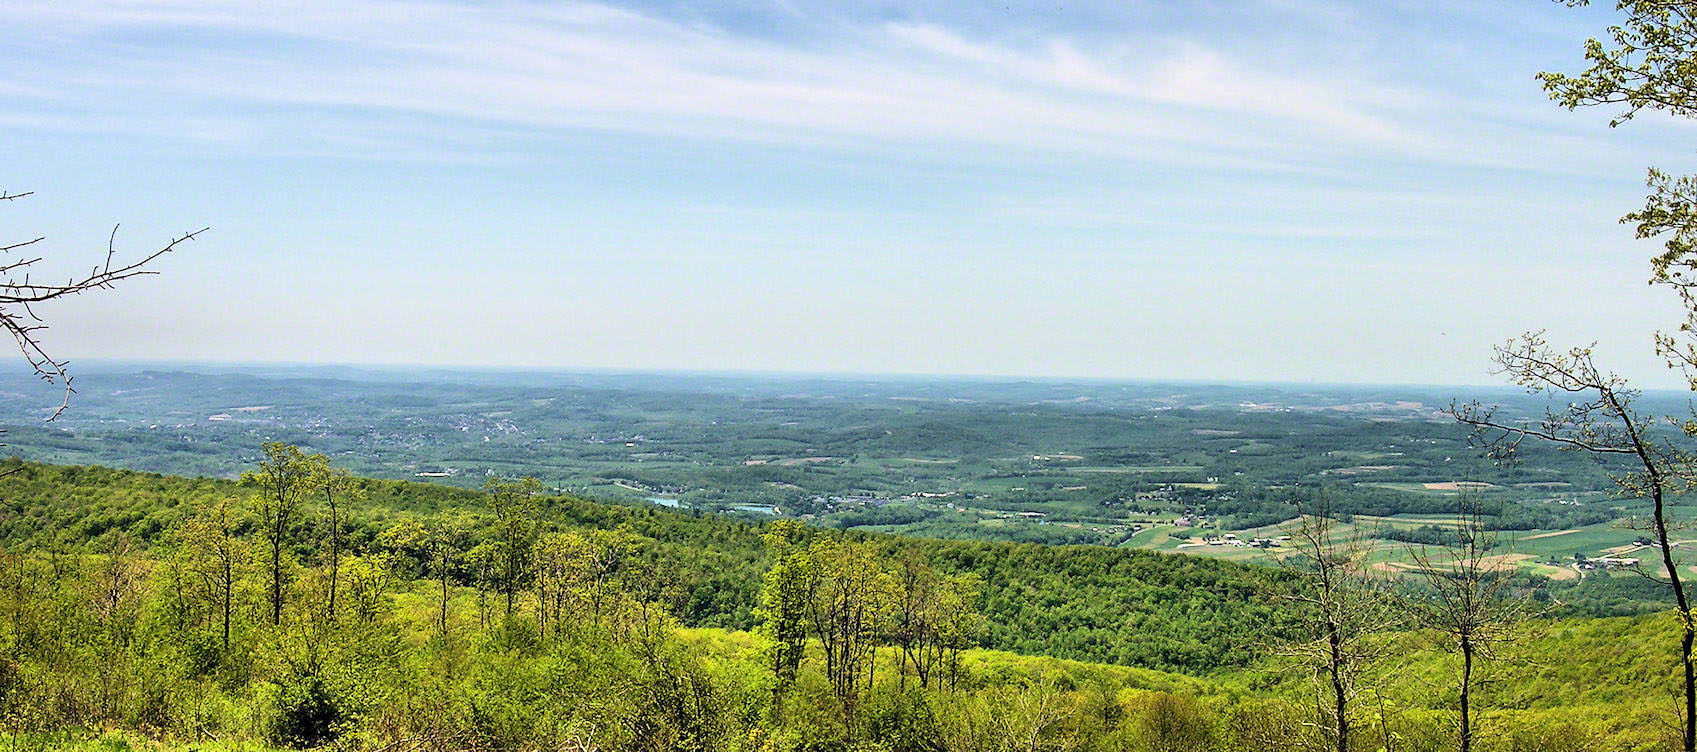 Derry Township, Westmoreland County, Pennsylvania, Derry